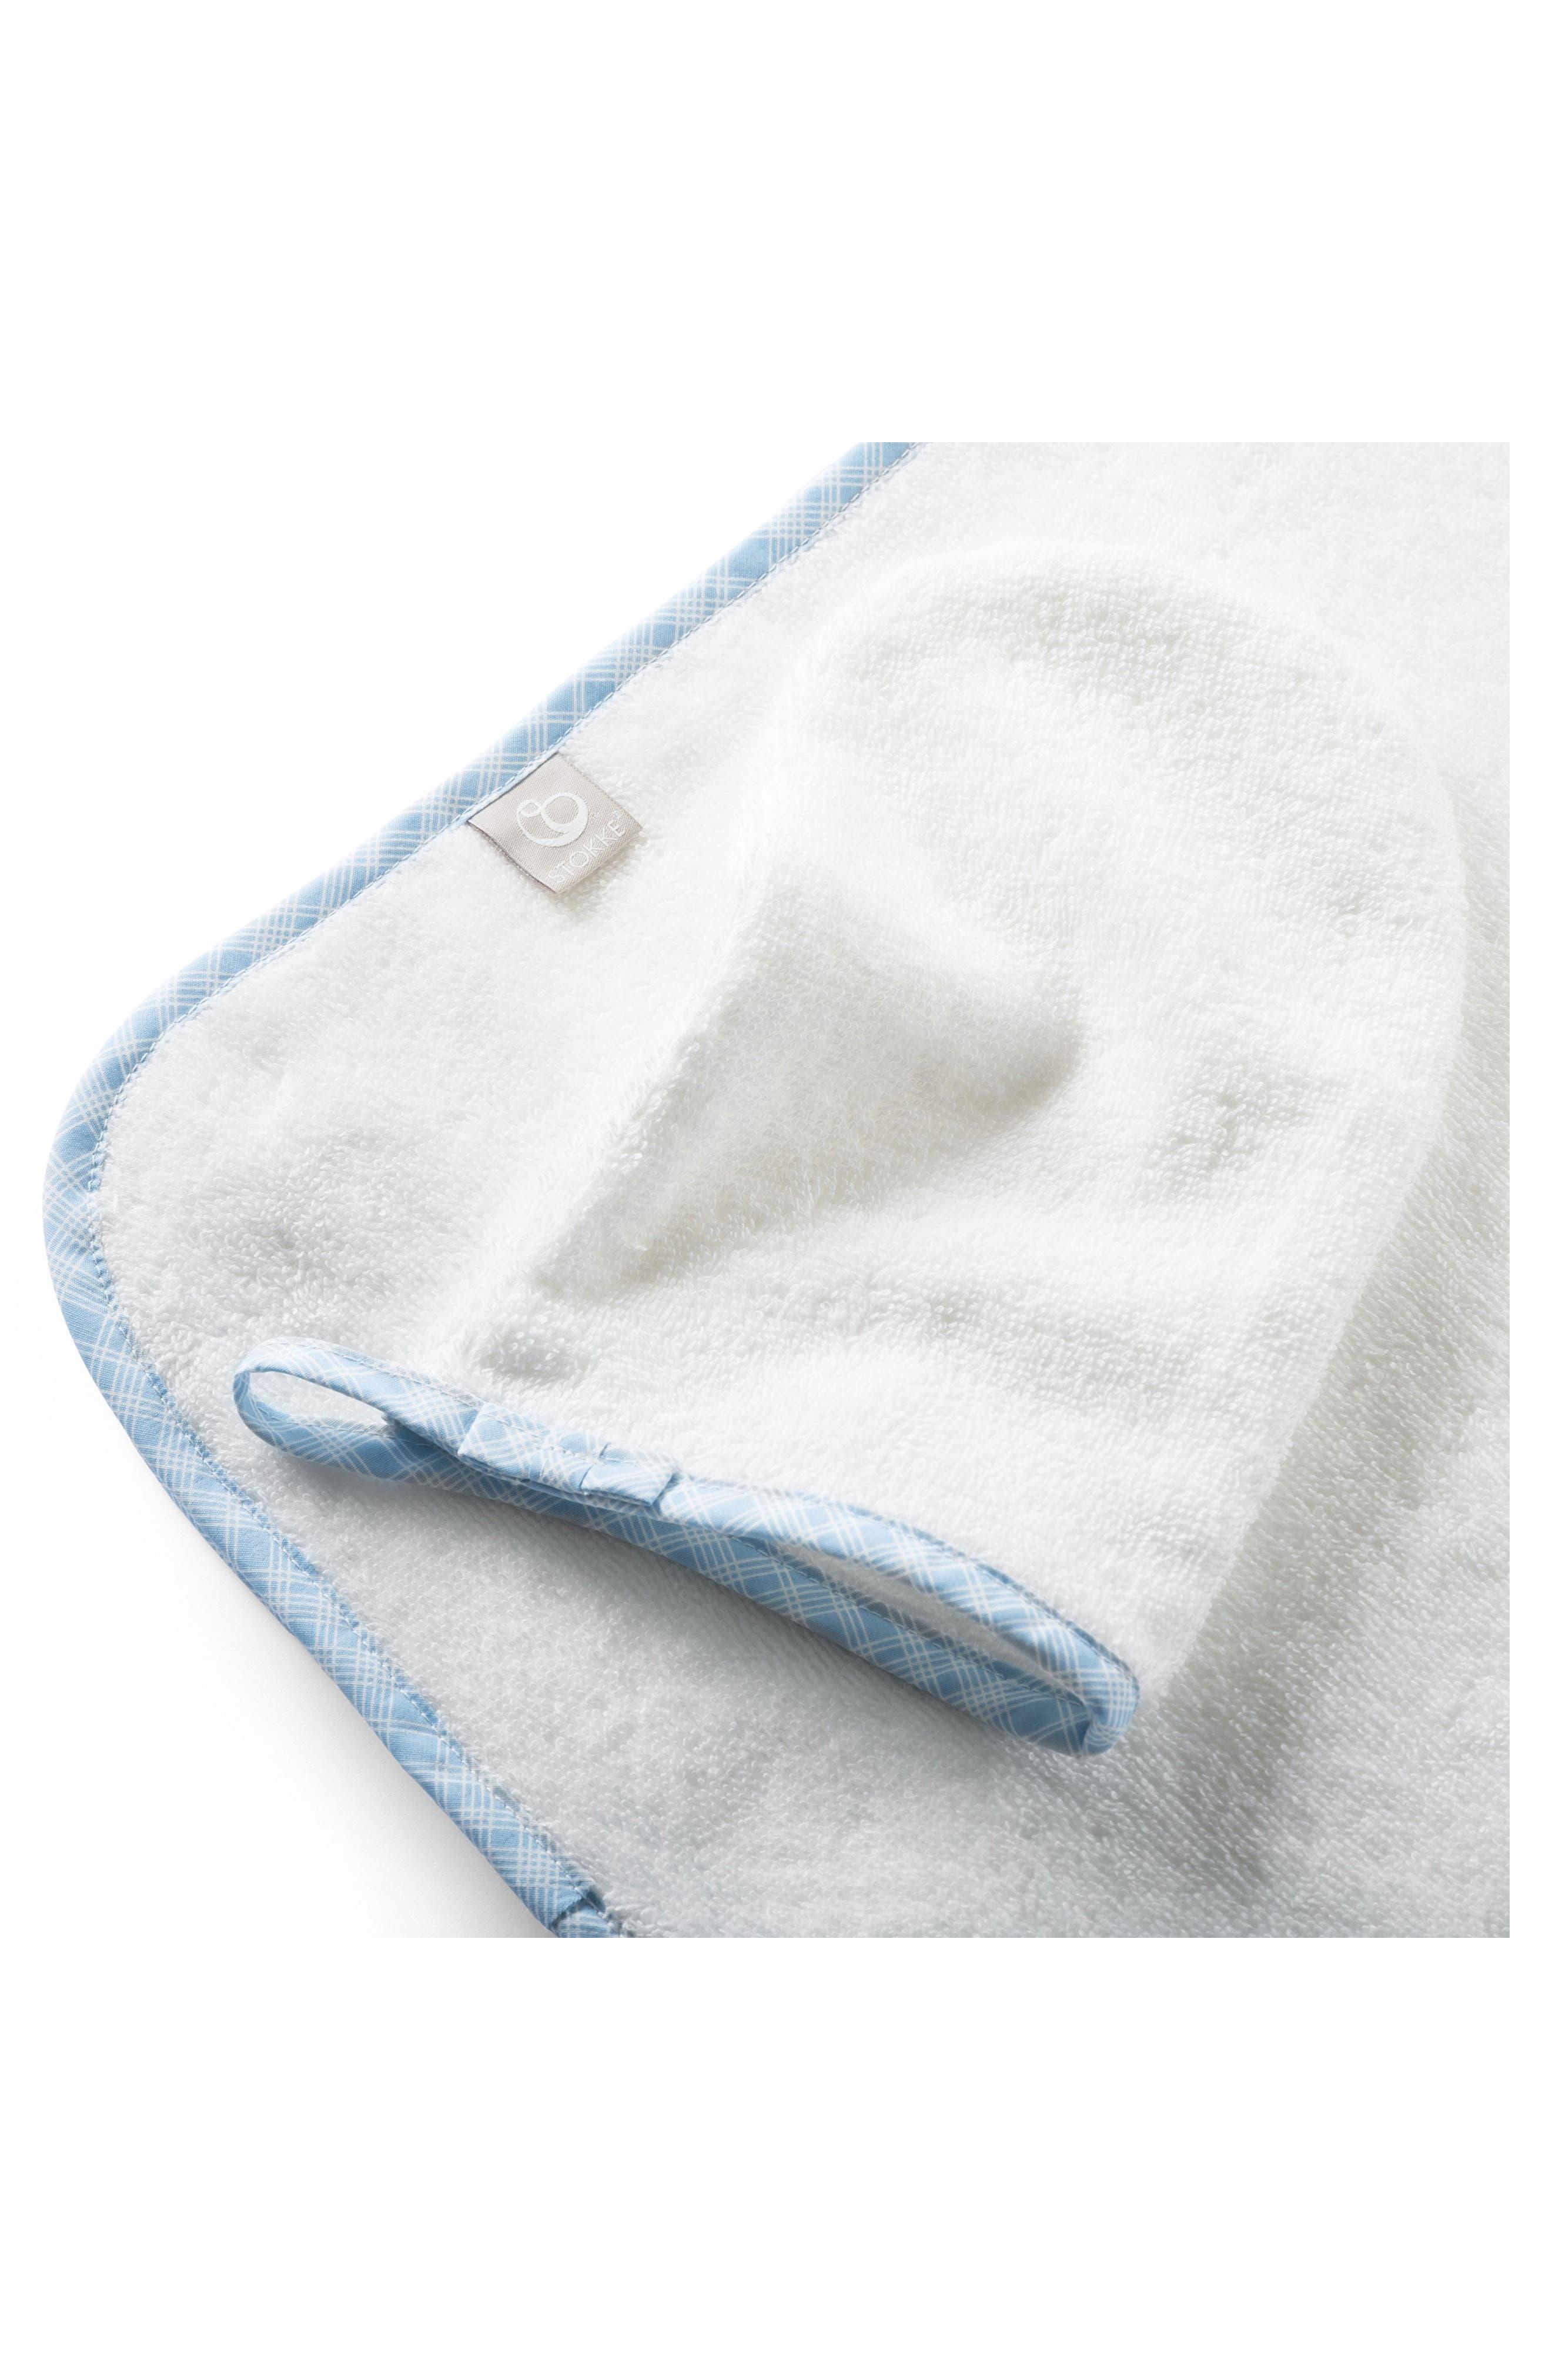 Hooded Towel & Bath Mitt Set,                             Alternate thumbnail 2, color,                             499